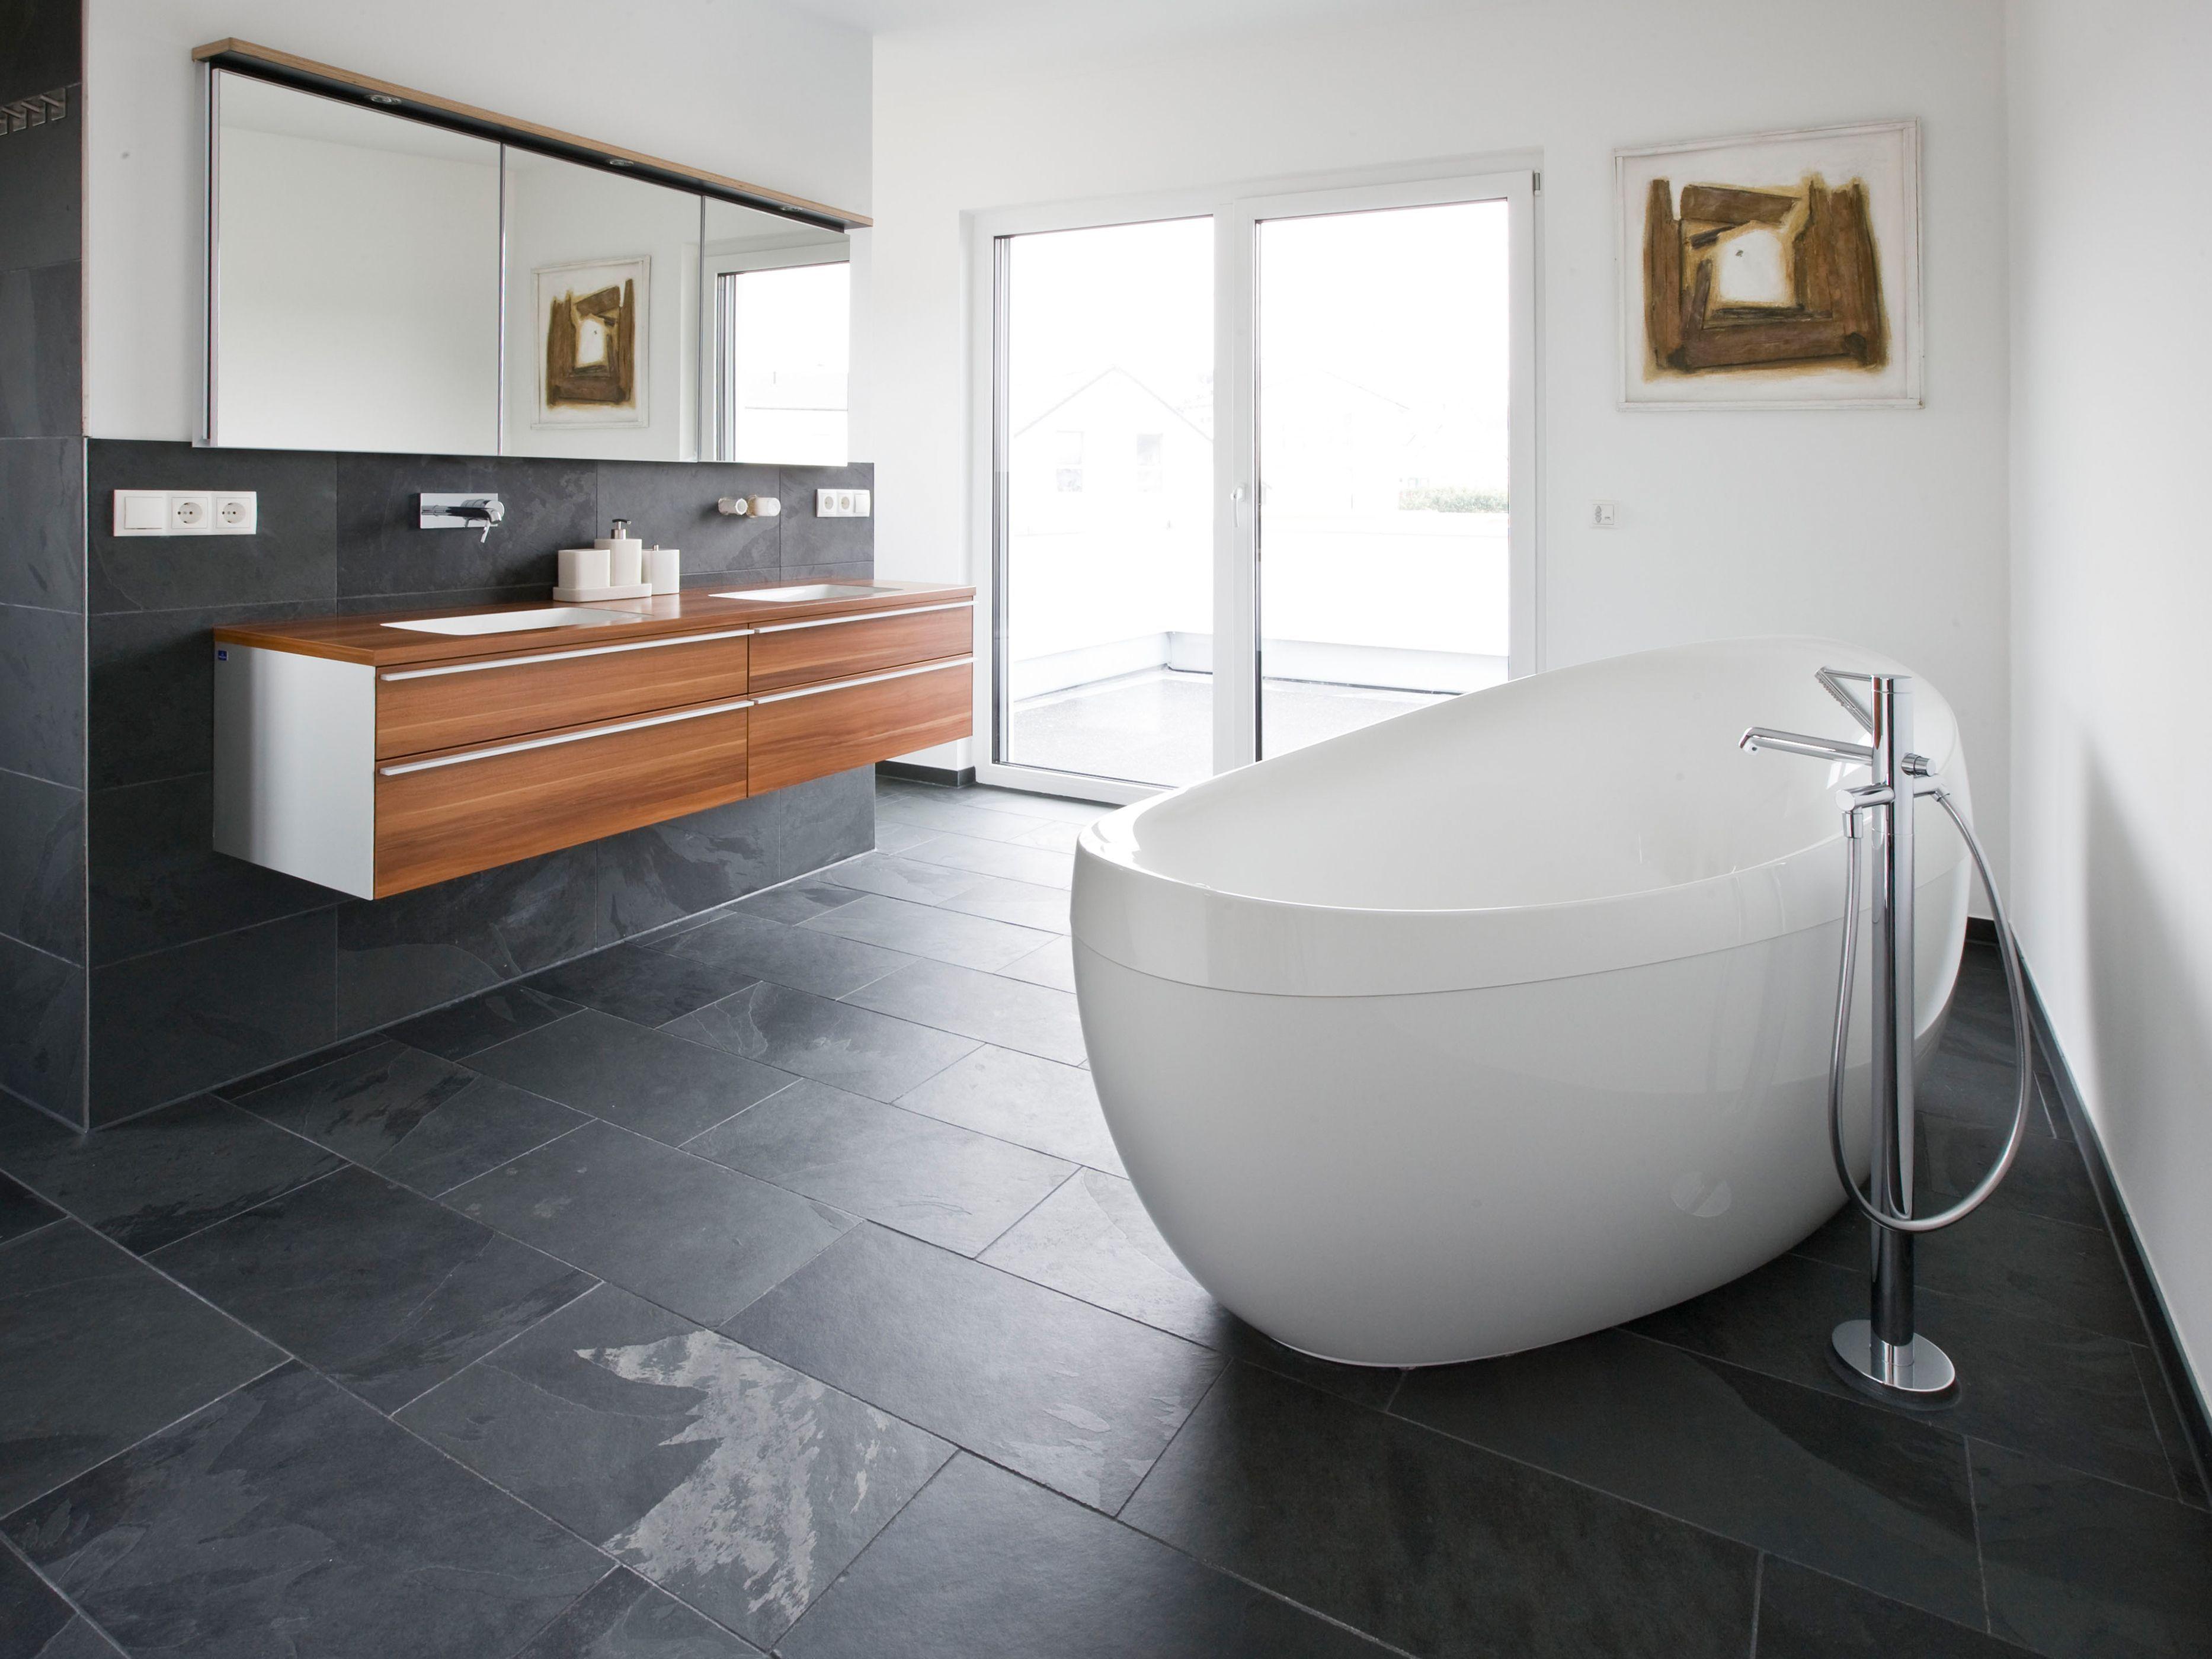 badezimmer modern schiefer (With images) | Modern bathroom ...